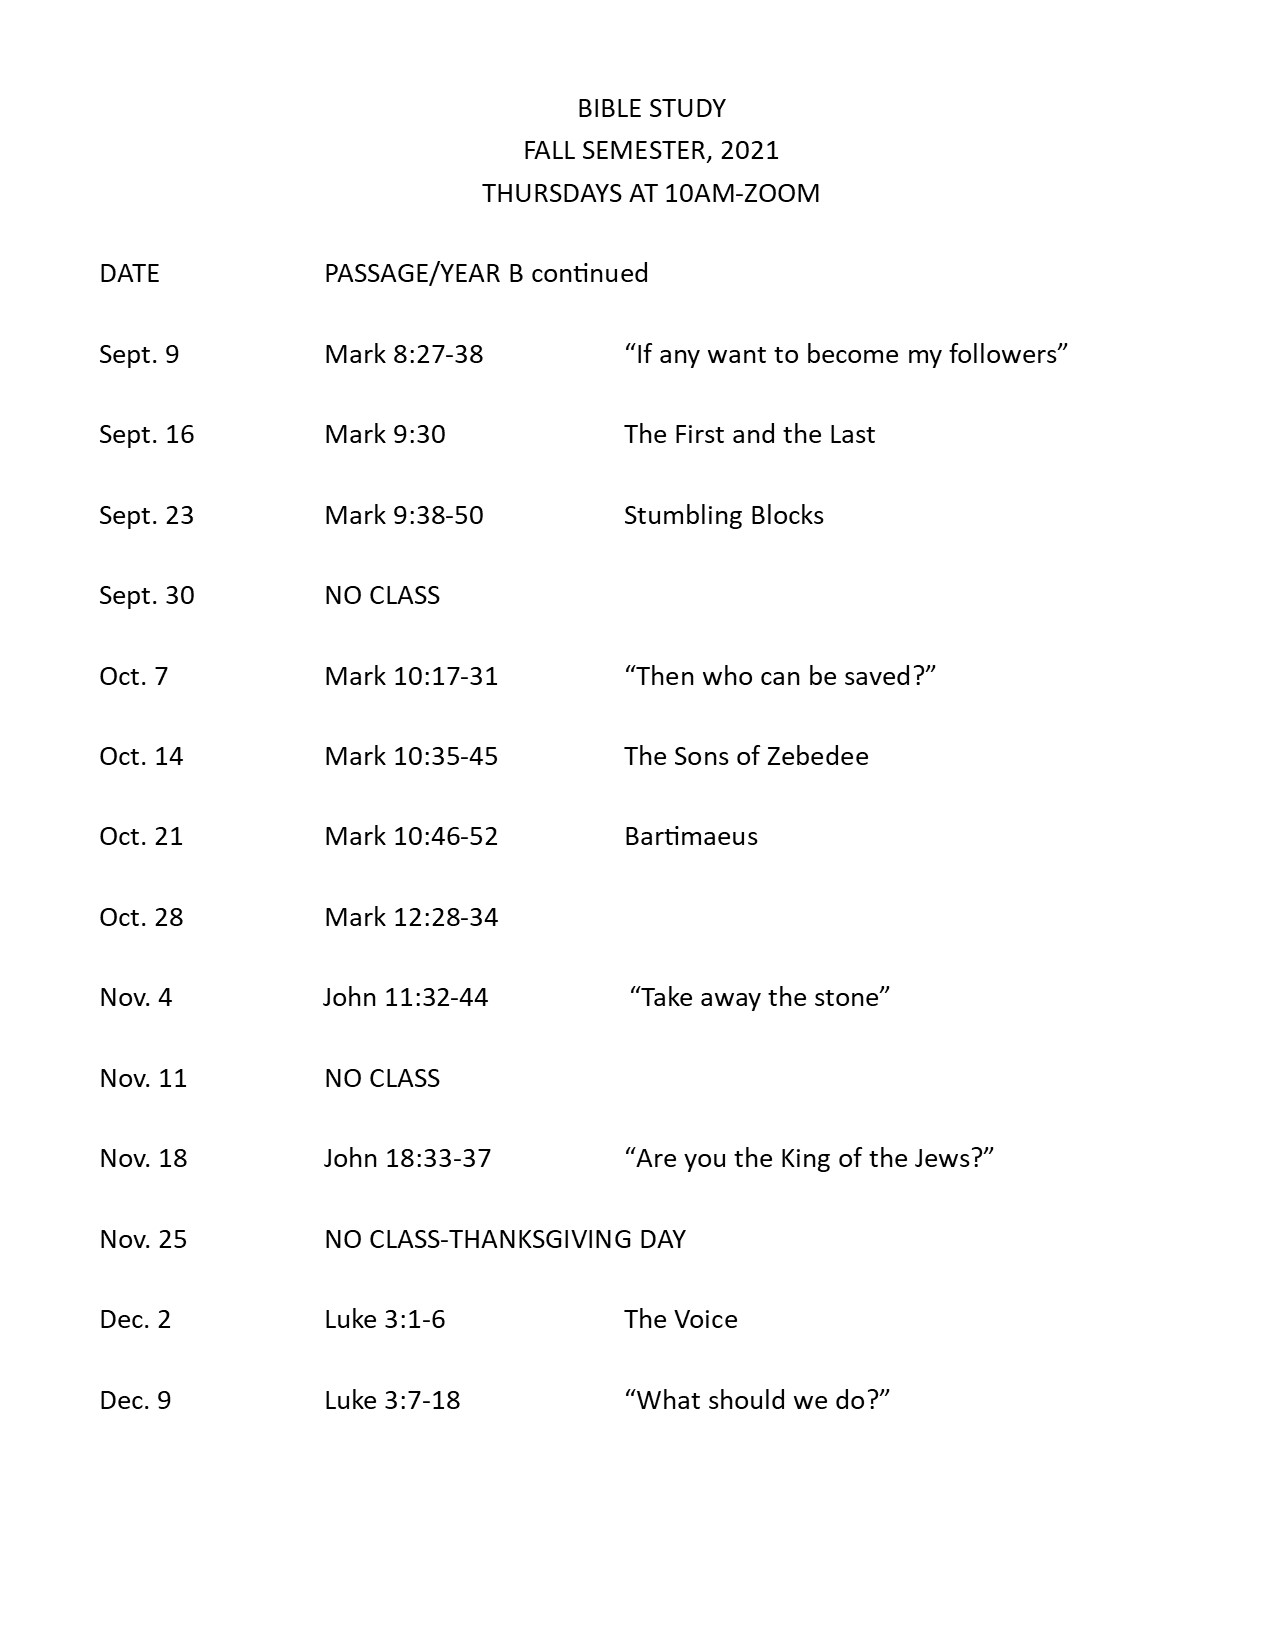 BIBLE STUDY Fall 2021 rev1